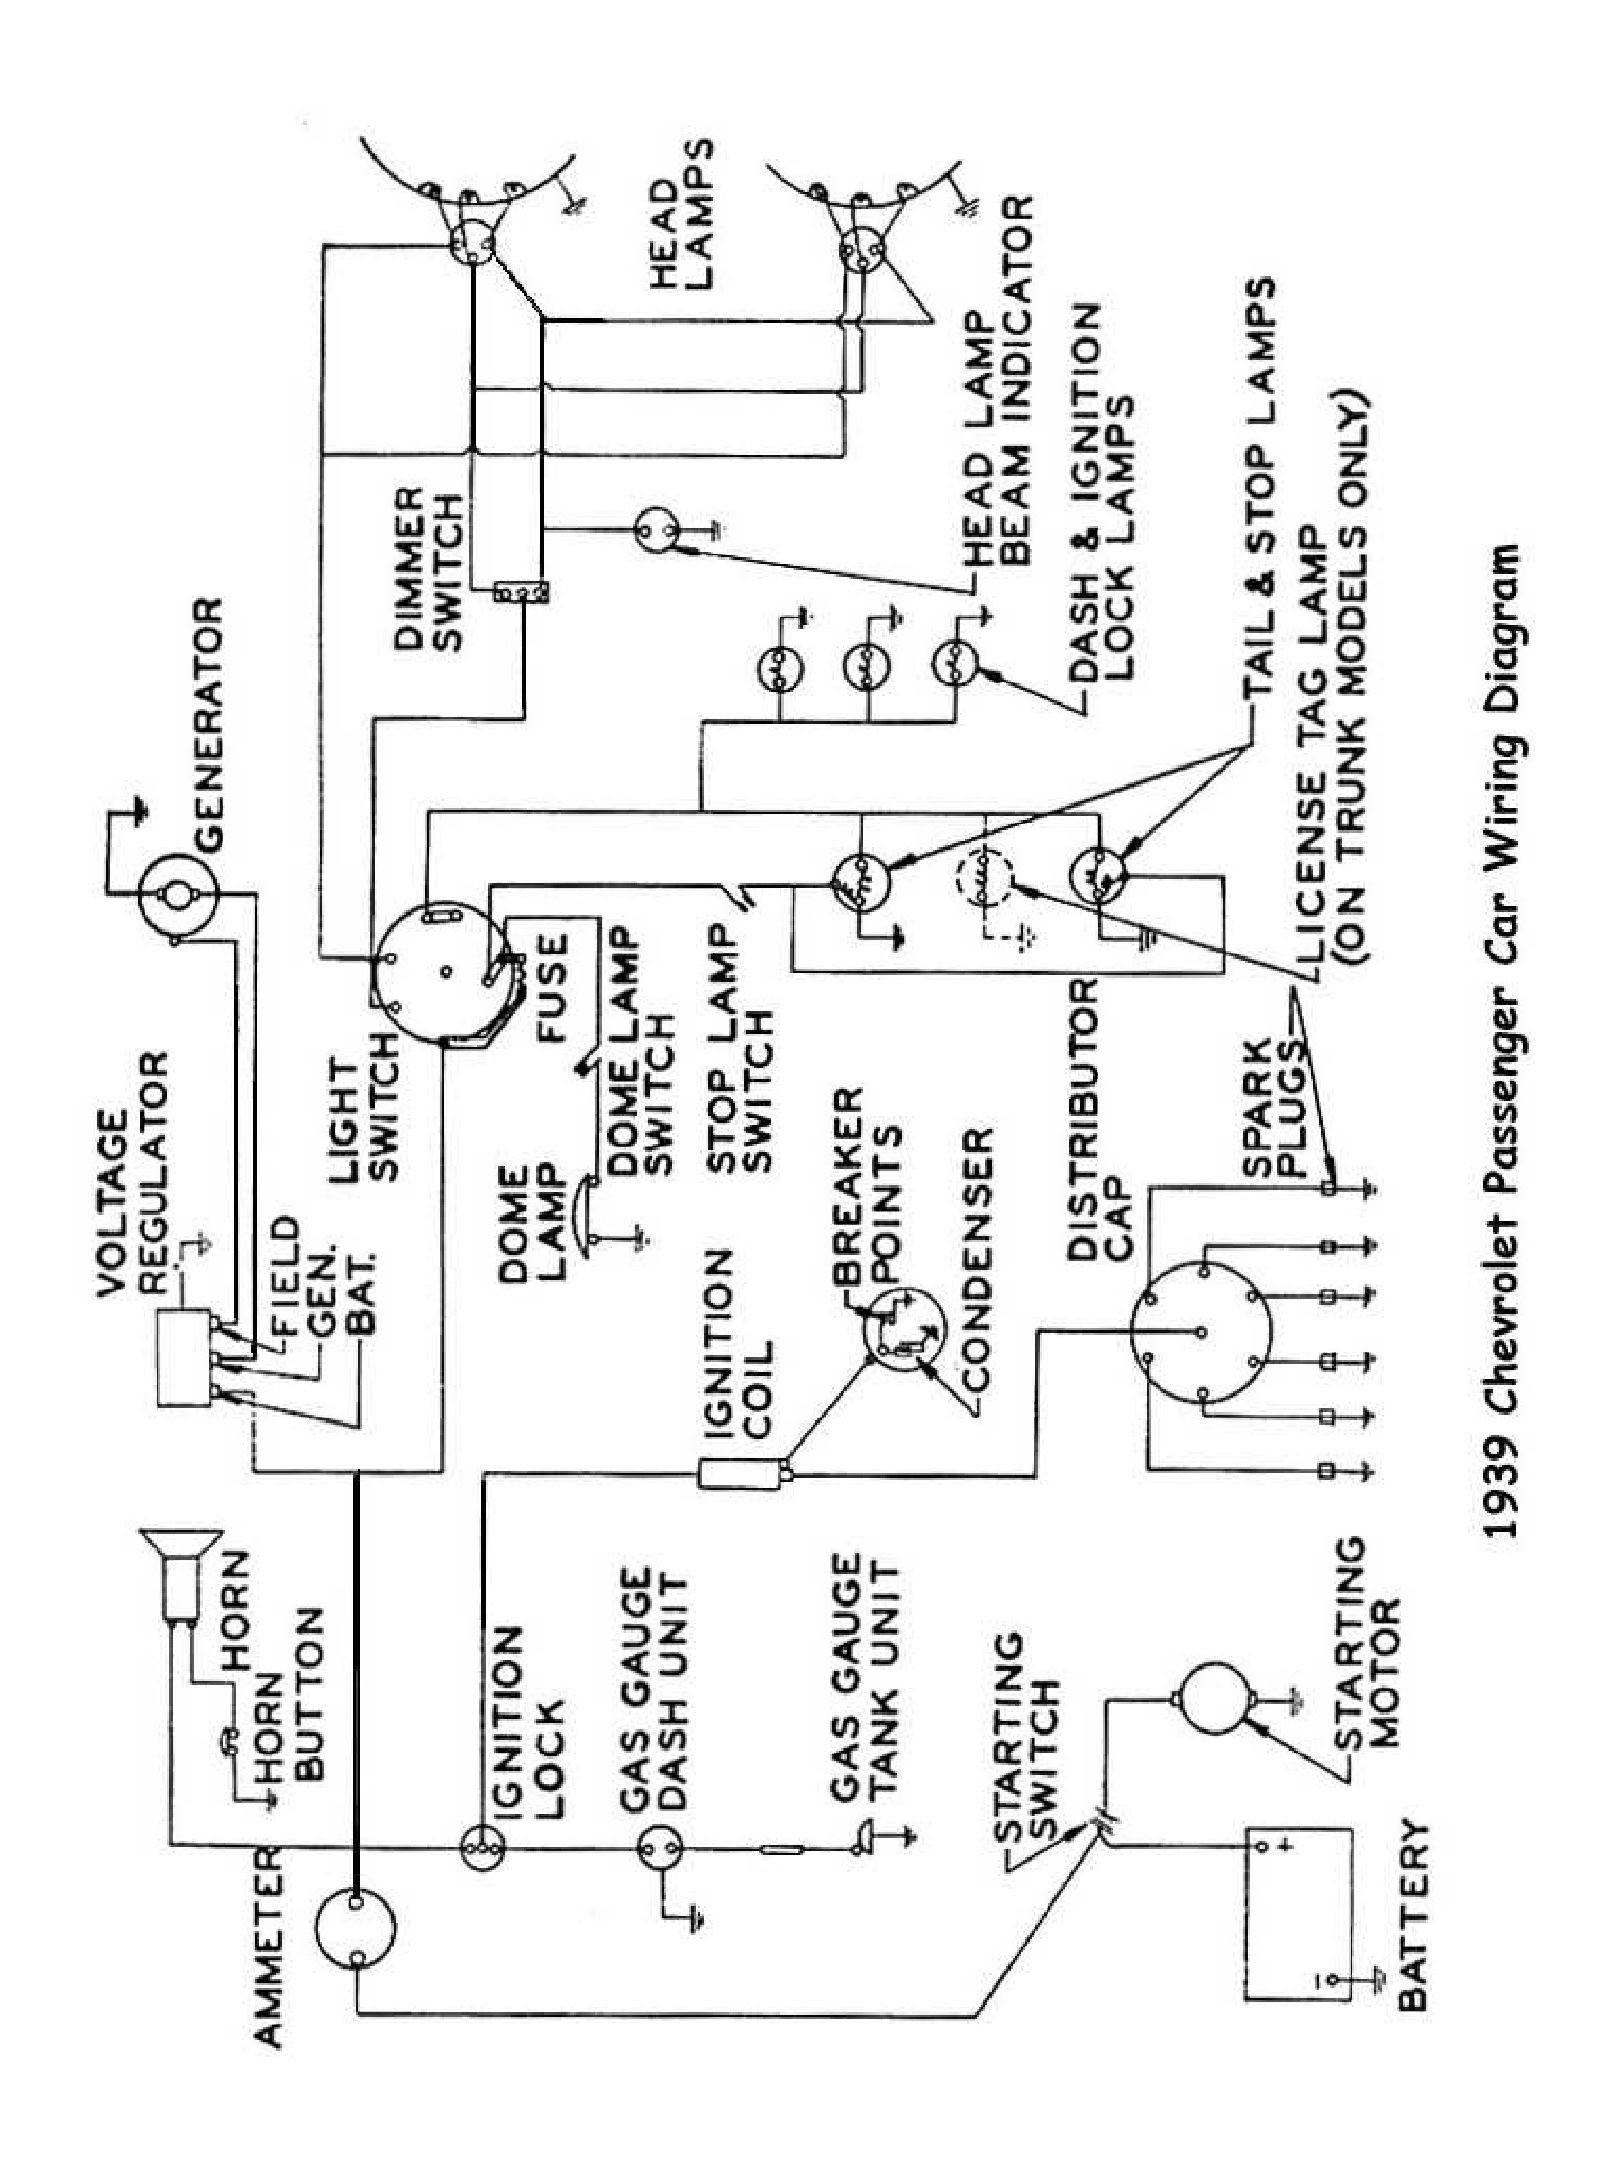 Car Wiring Diagram software Bulldog Vehicle Remote Start and Keyless Entry Installation Security Of Car Wiring Diagram software